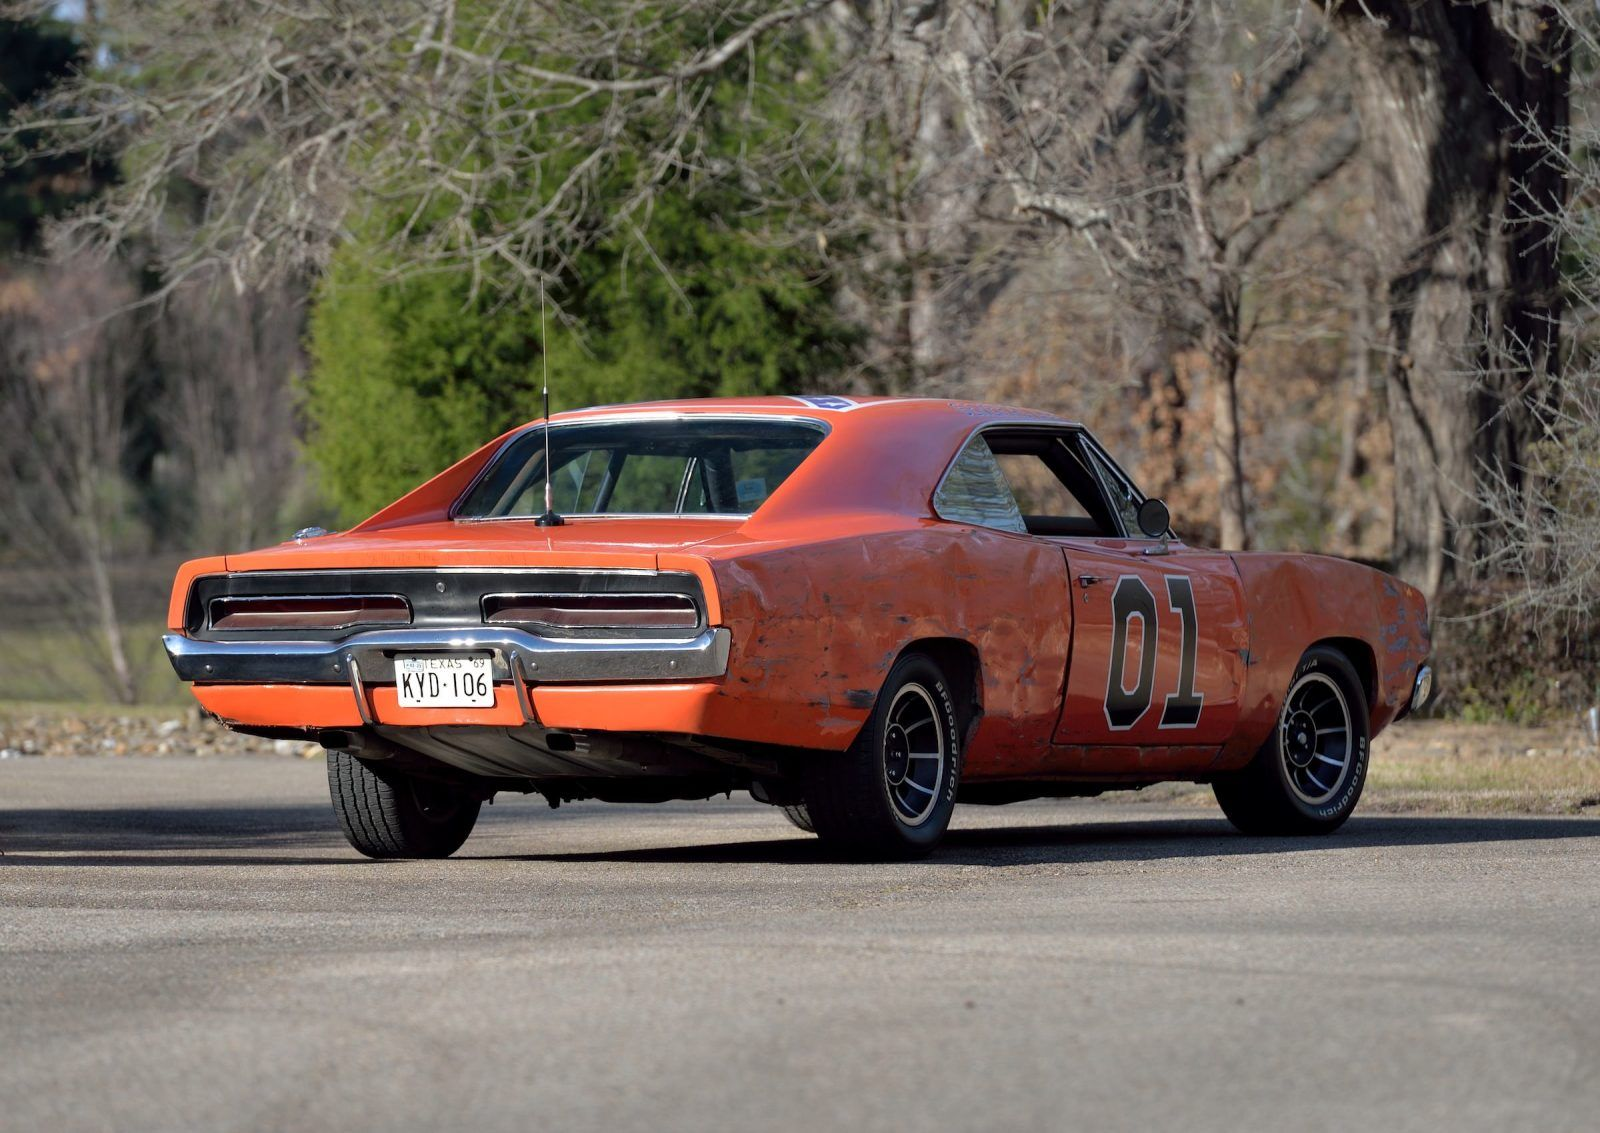 For Sale An Original Dukes Of Hazzard Movie Stunt Car Dodge Charger Dodge Charger For Sale General Lee